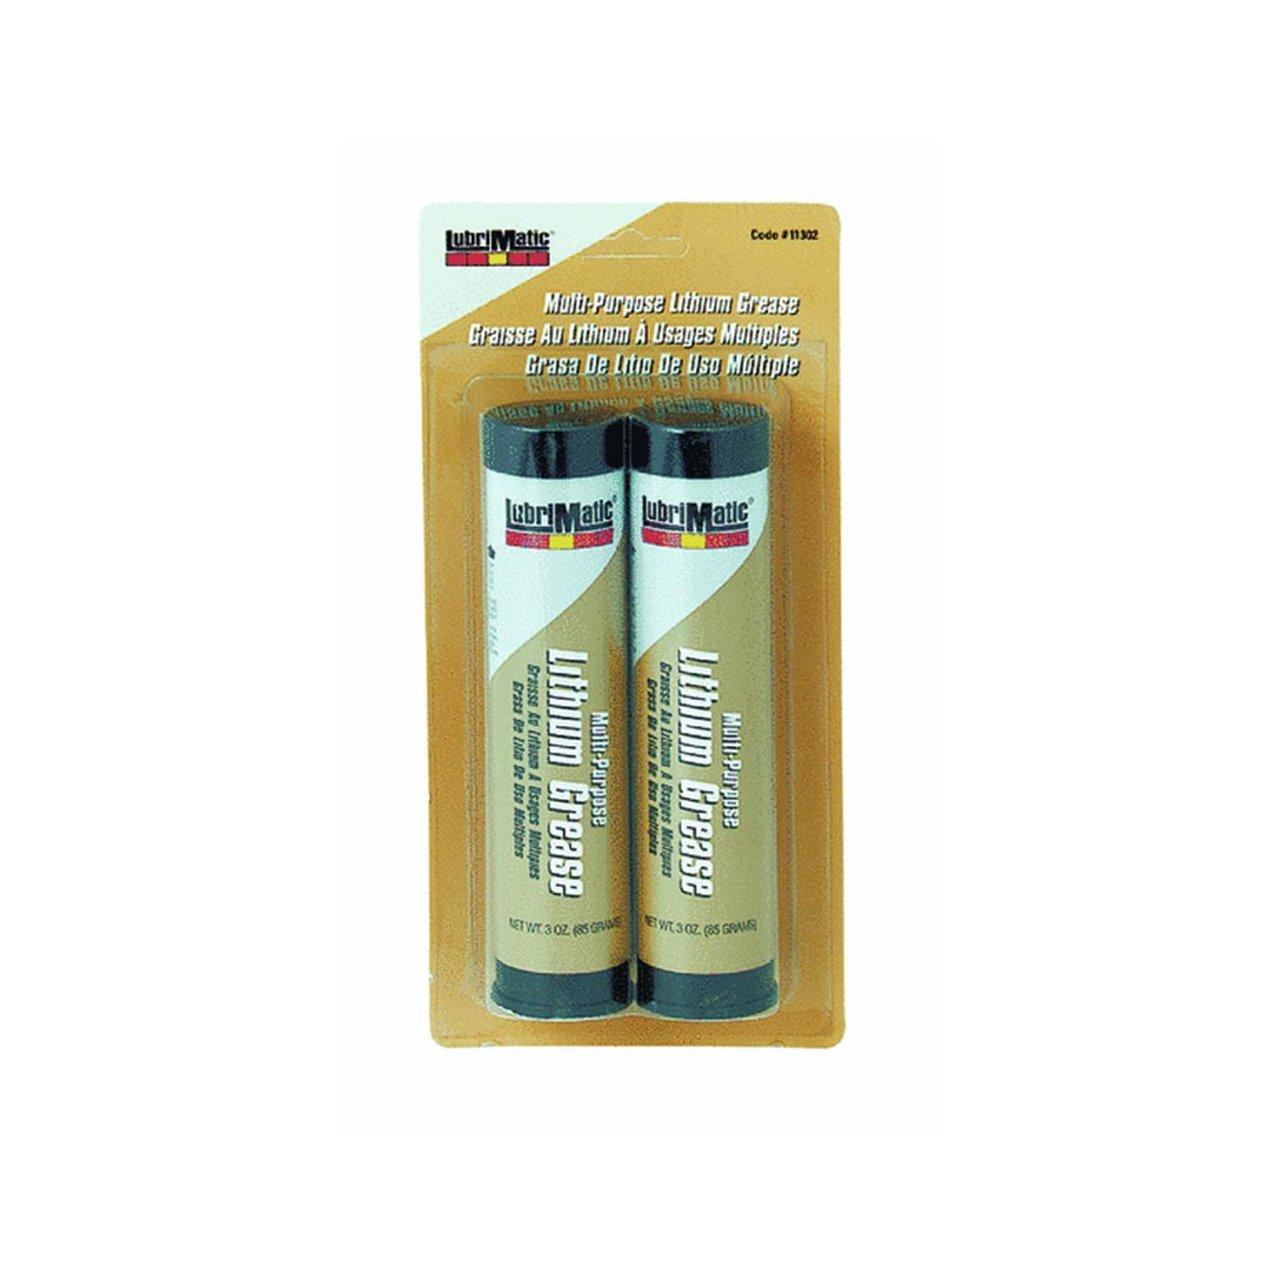 Plews-Edelmann 11302 Lubrimatic Multi-Purpose Lithium Grease, 3 oz Cartridge, Black (Pack of 2)